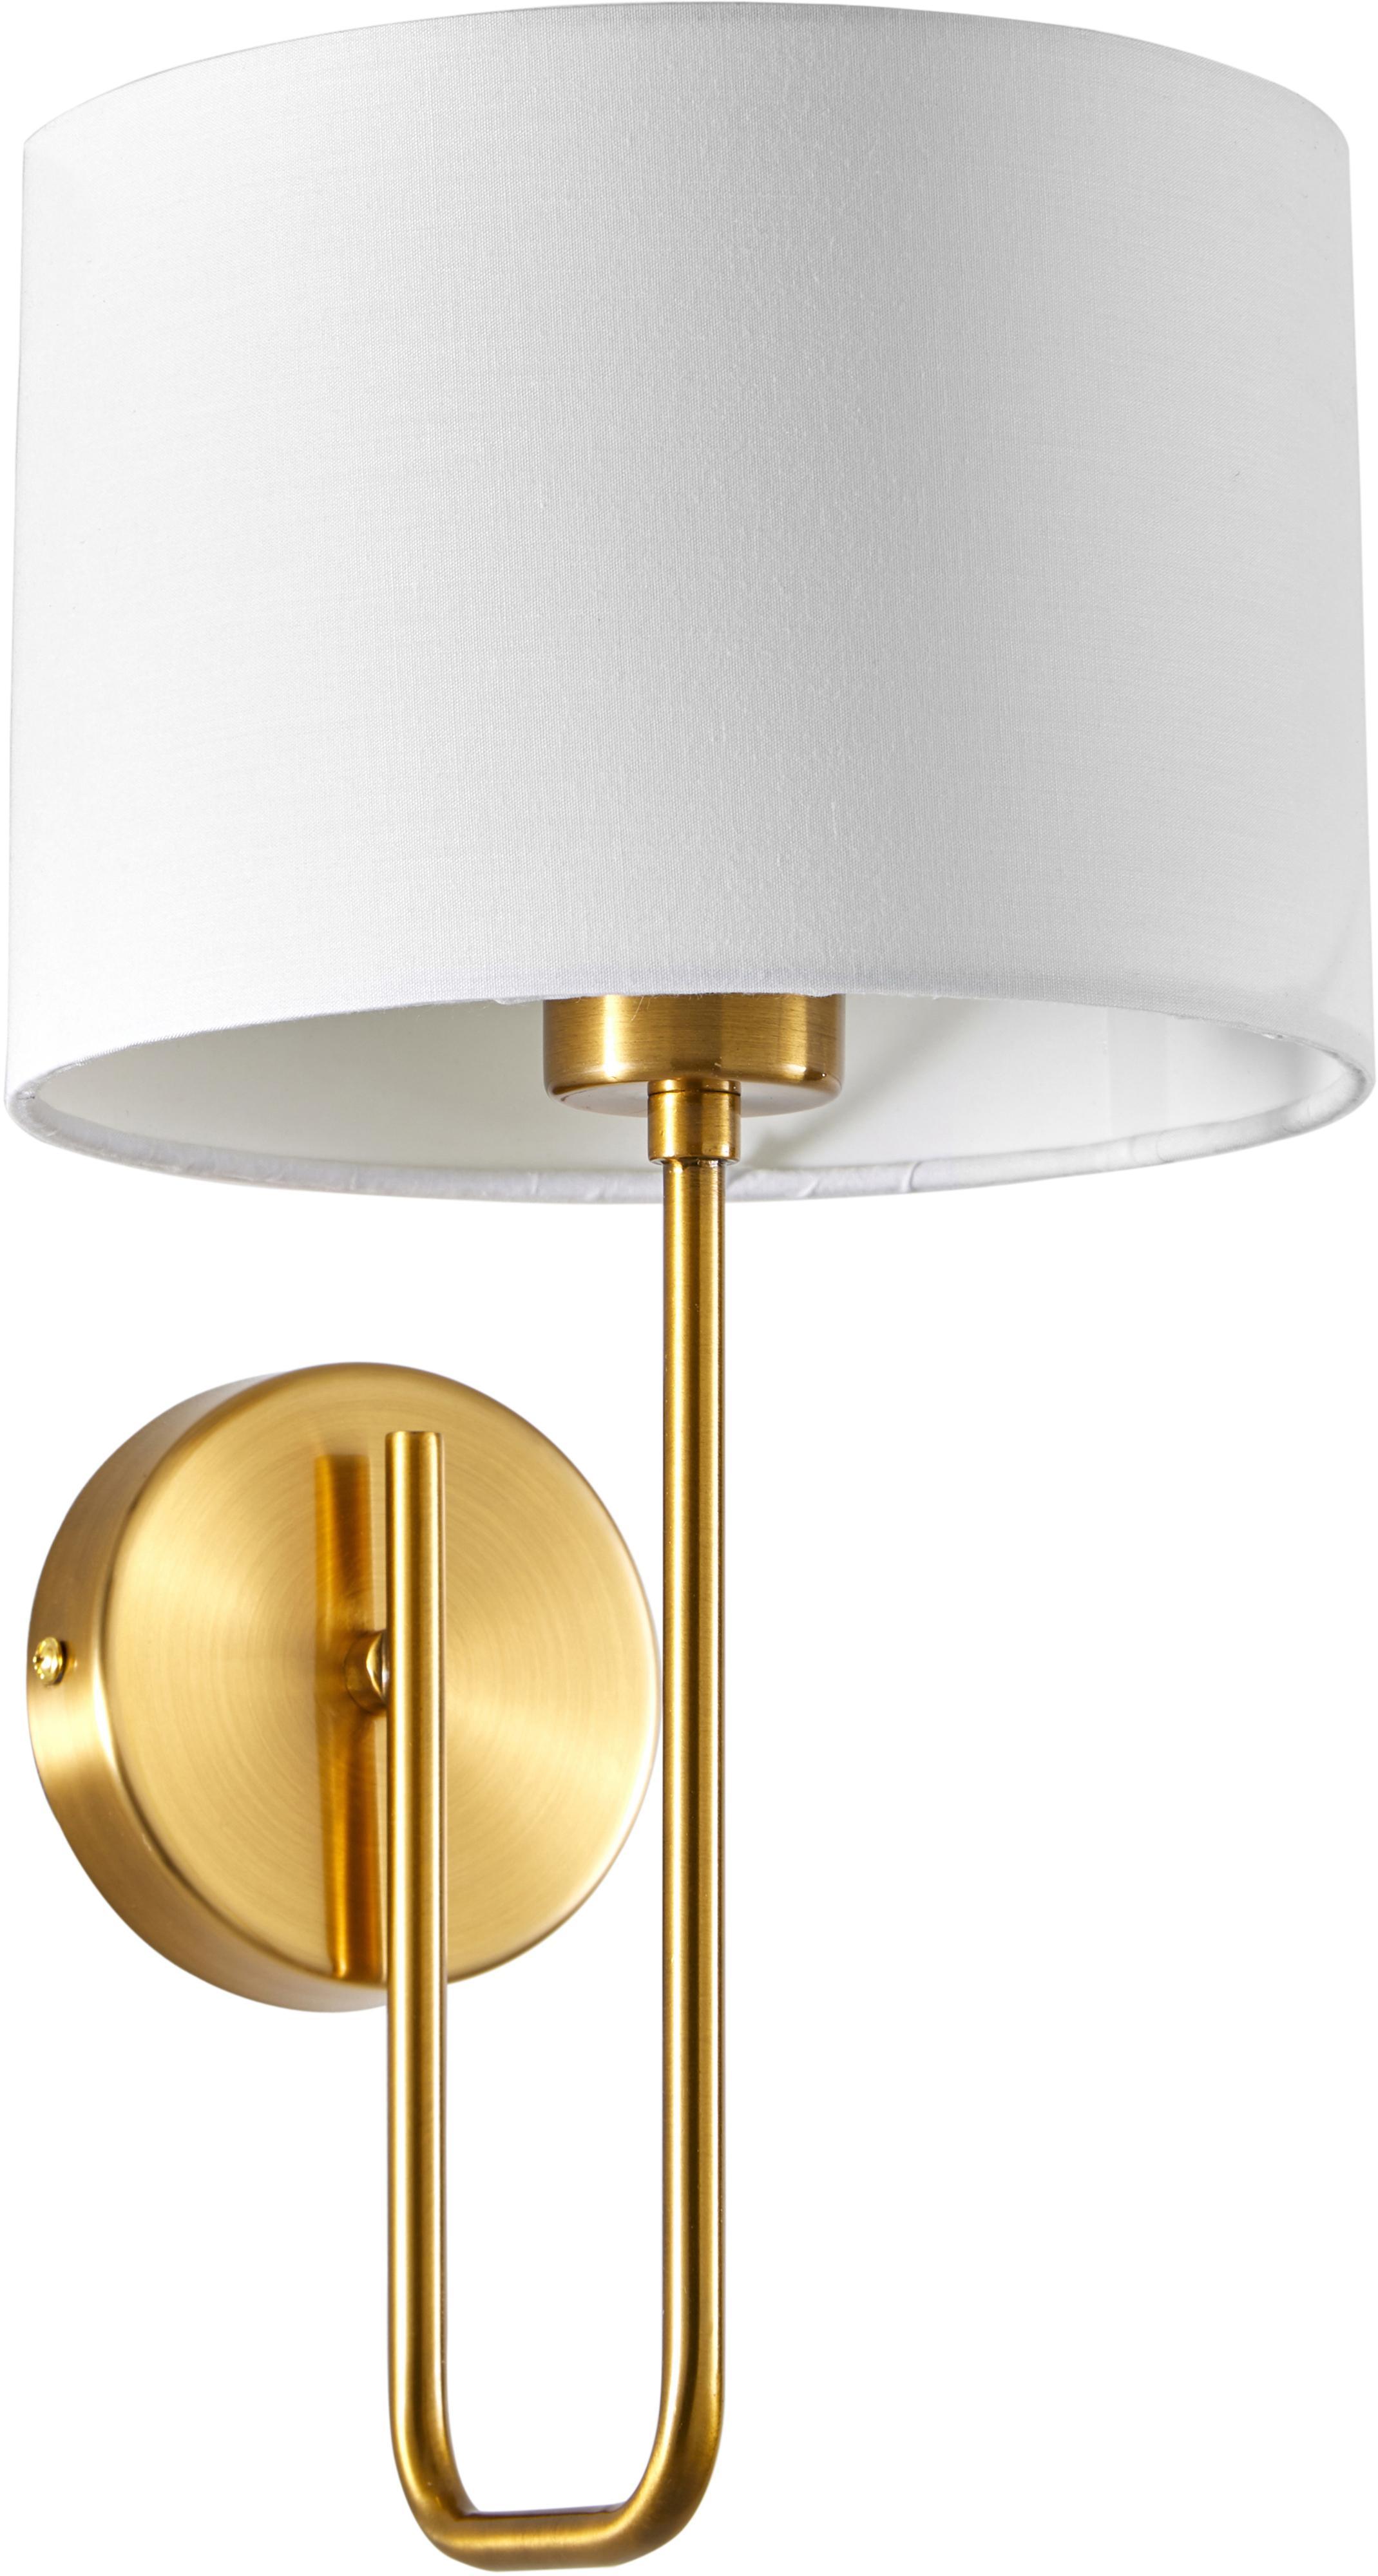 Wandlamp Montreal, Lampenkap: textiel, Wit, goudkleurig, Ø 20 x H 36 cm